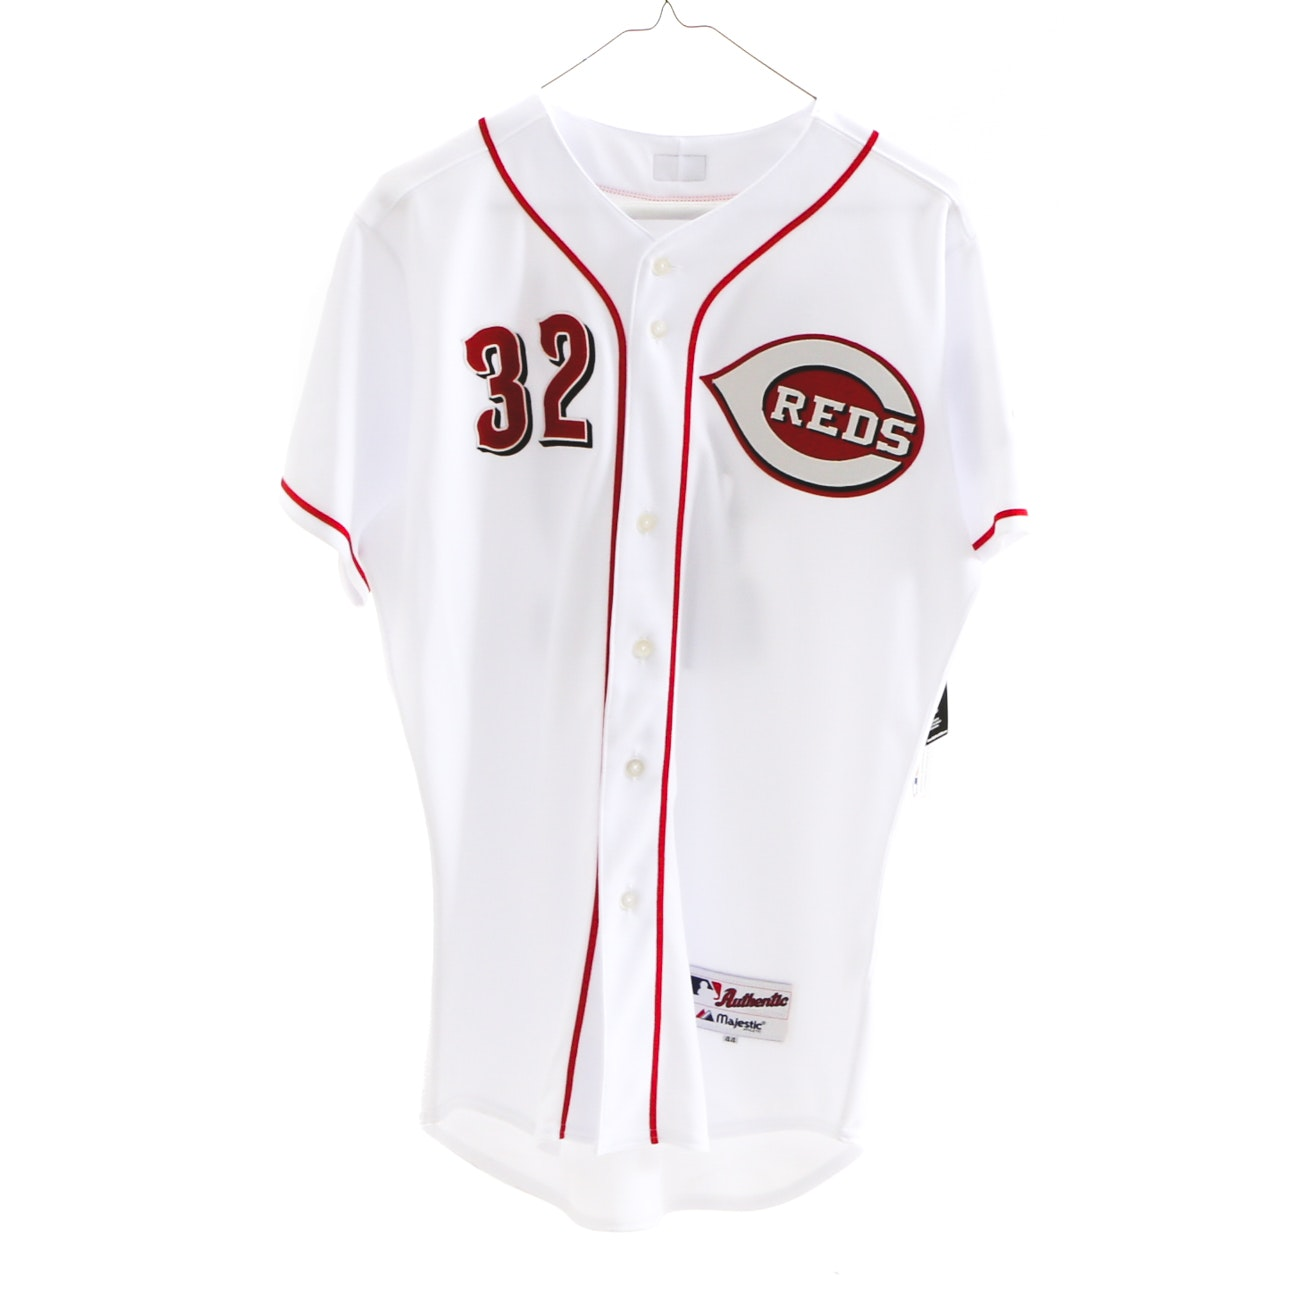 Jay Bruce Reds Signed Baseball Jersey MLB COA